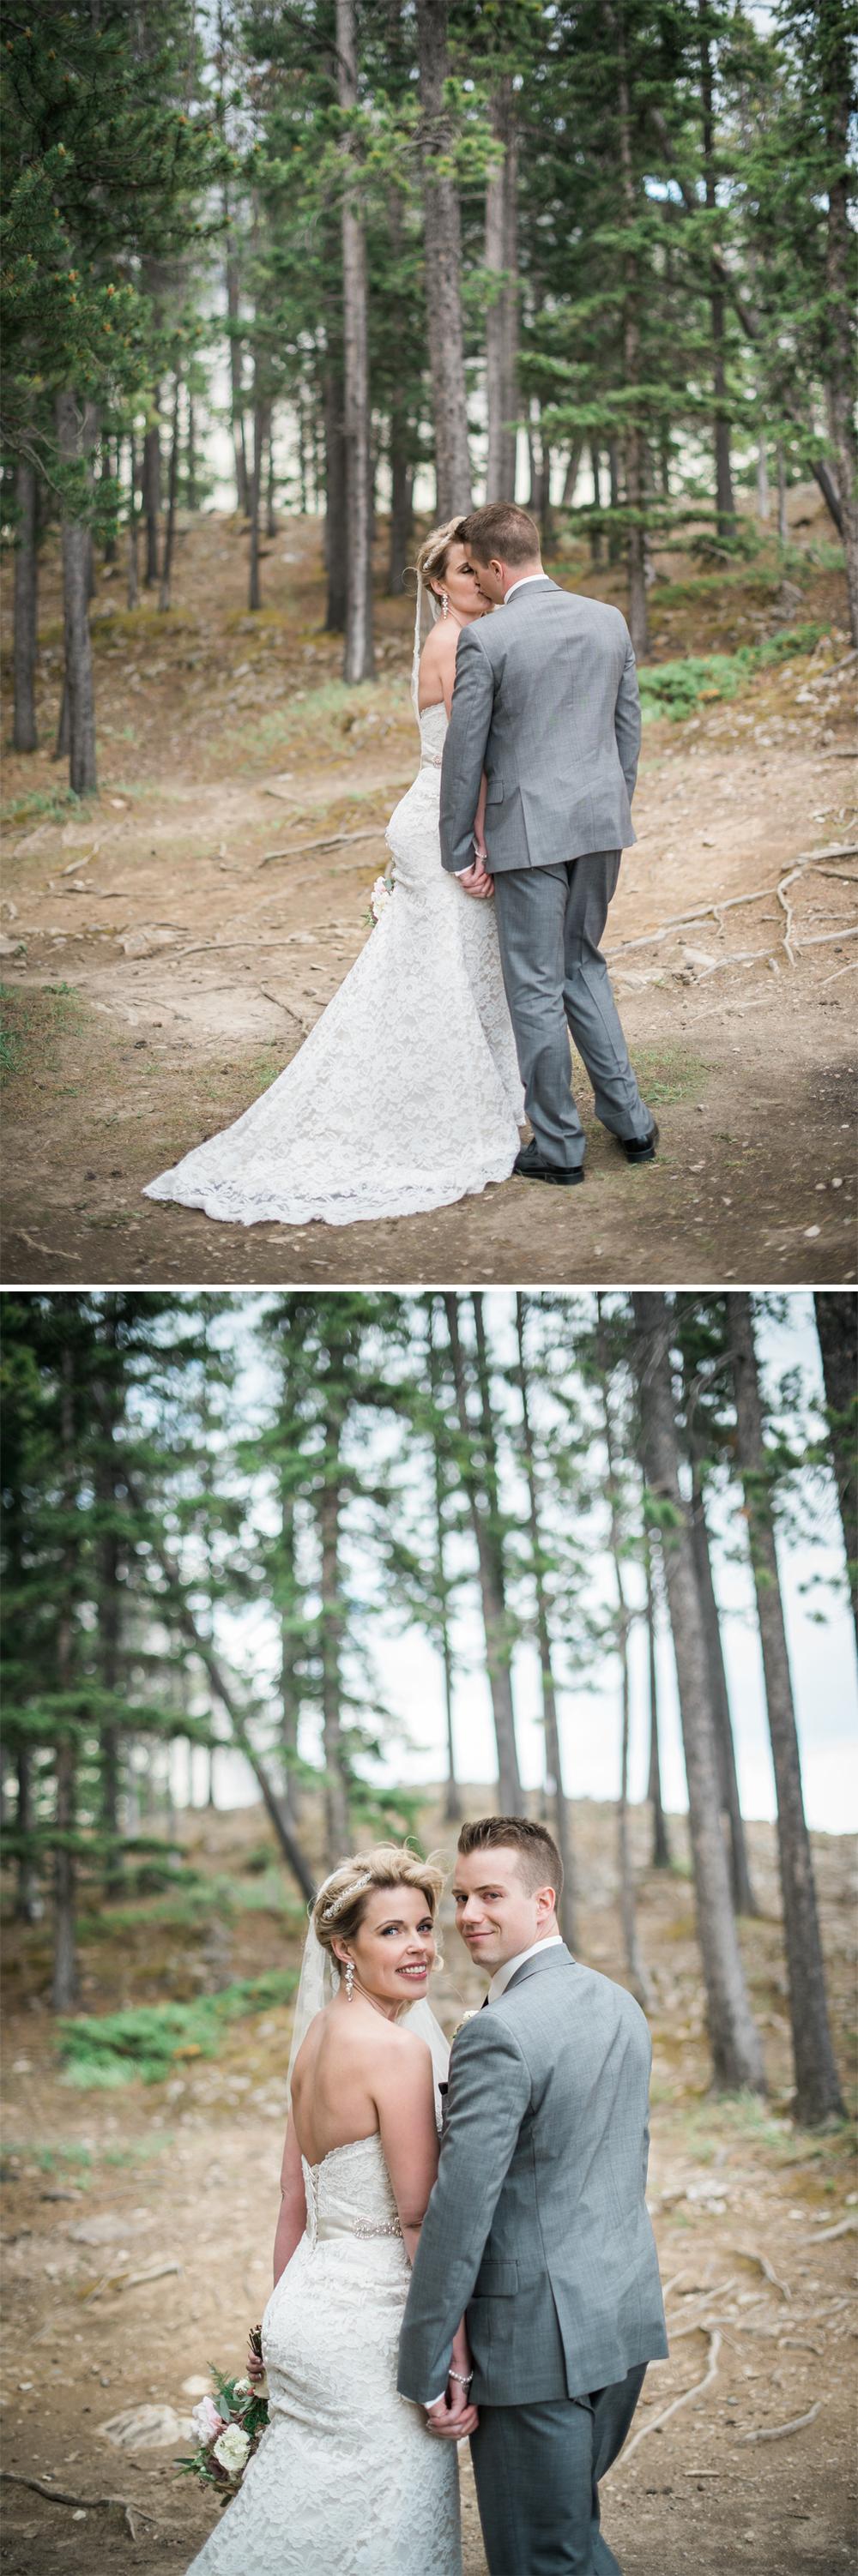 Banff Wedding Photographer  17.jpg